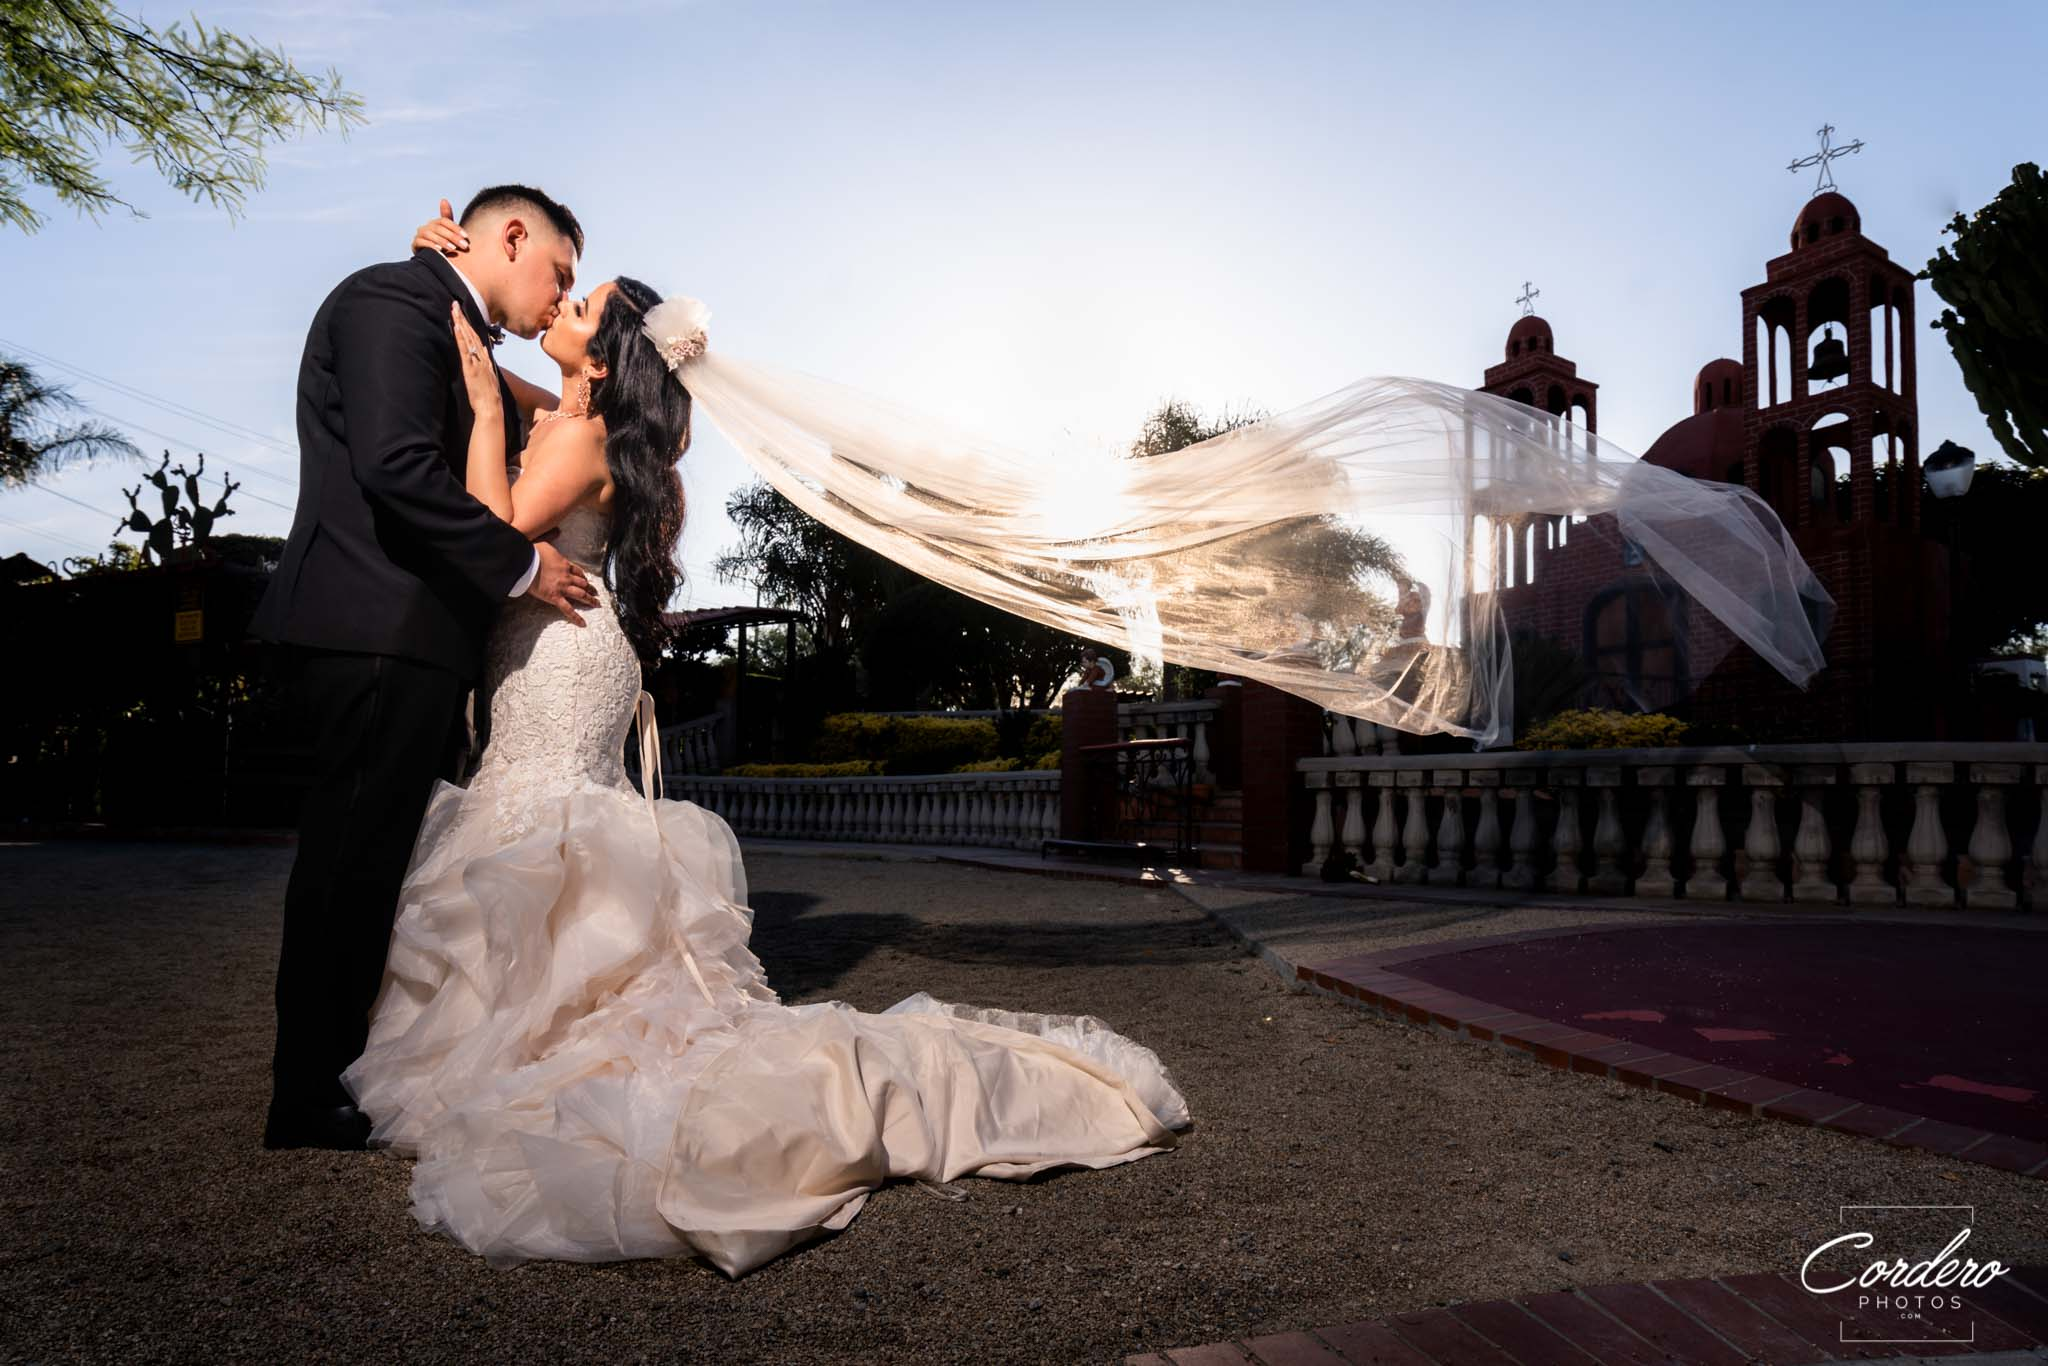 Andrea-and-Valentin-Wedding-WEB-06074.jpg